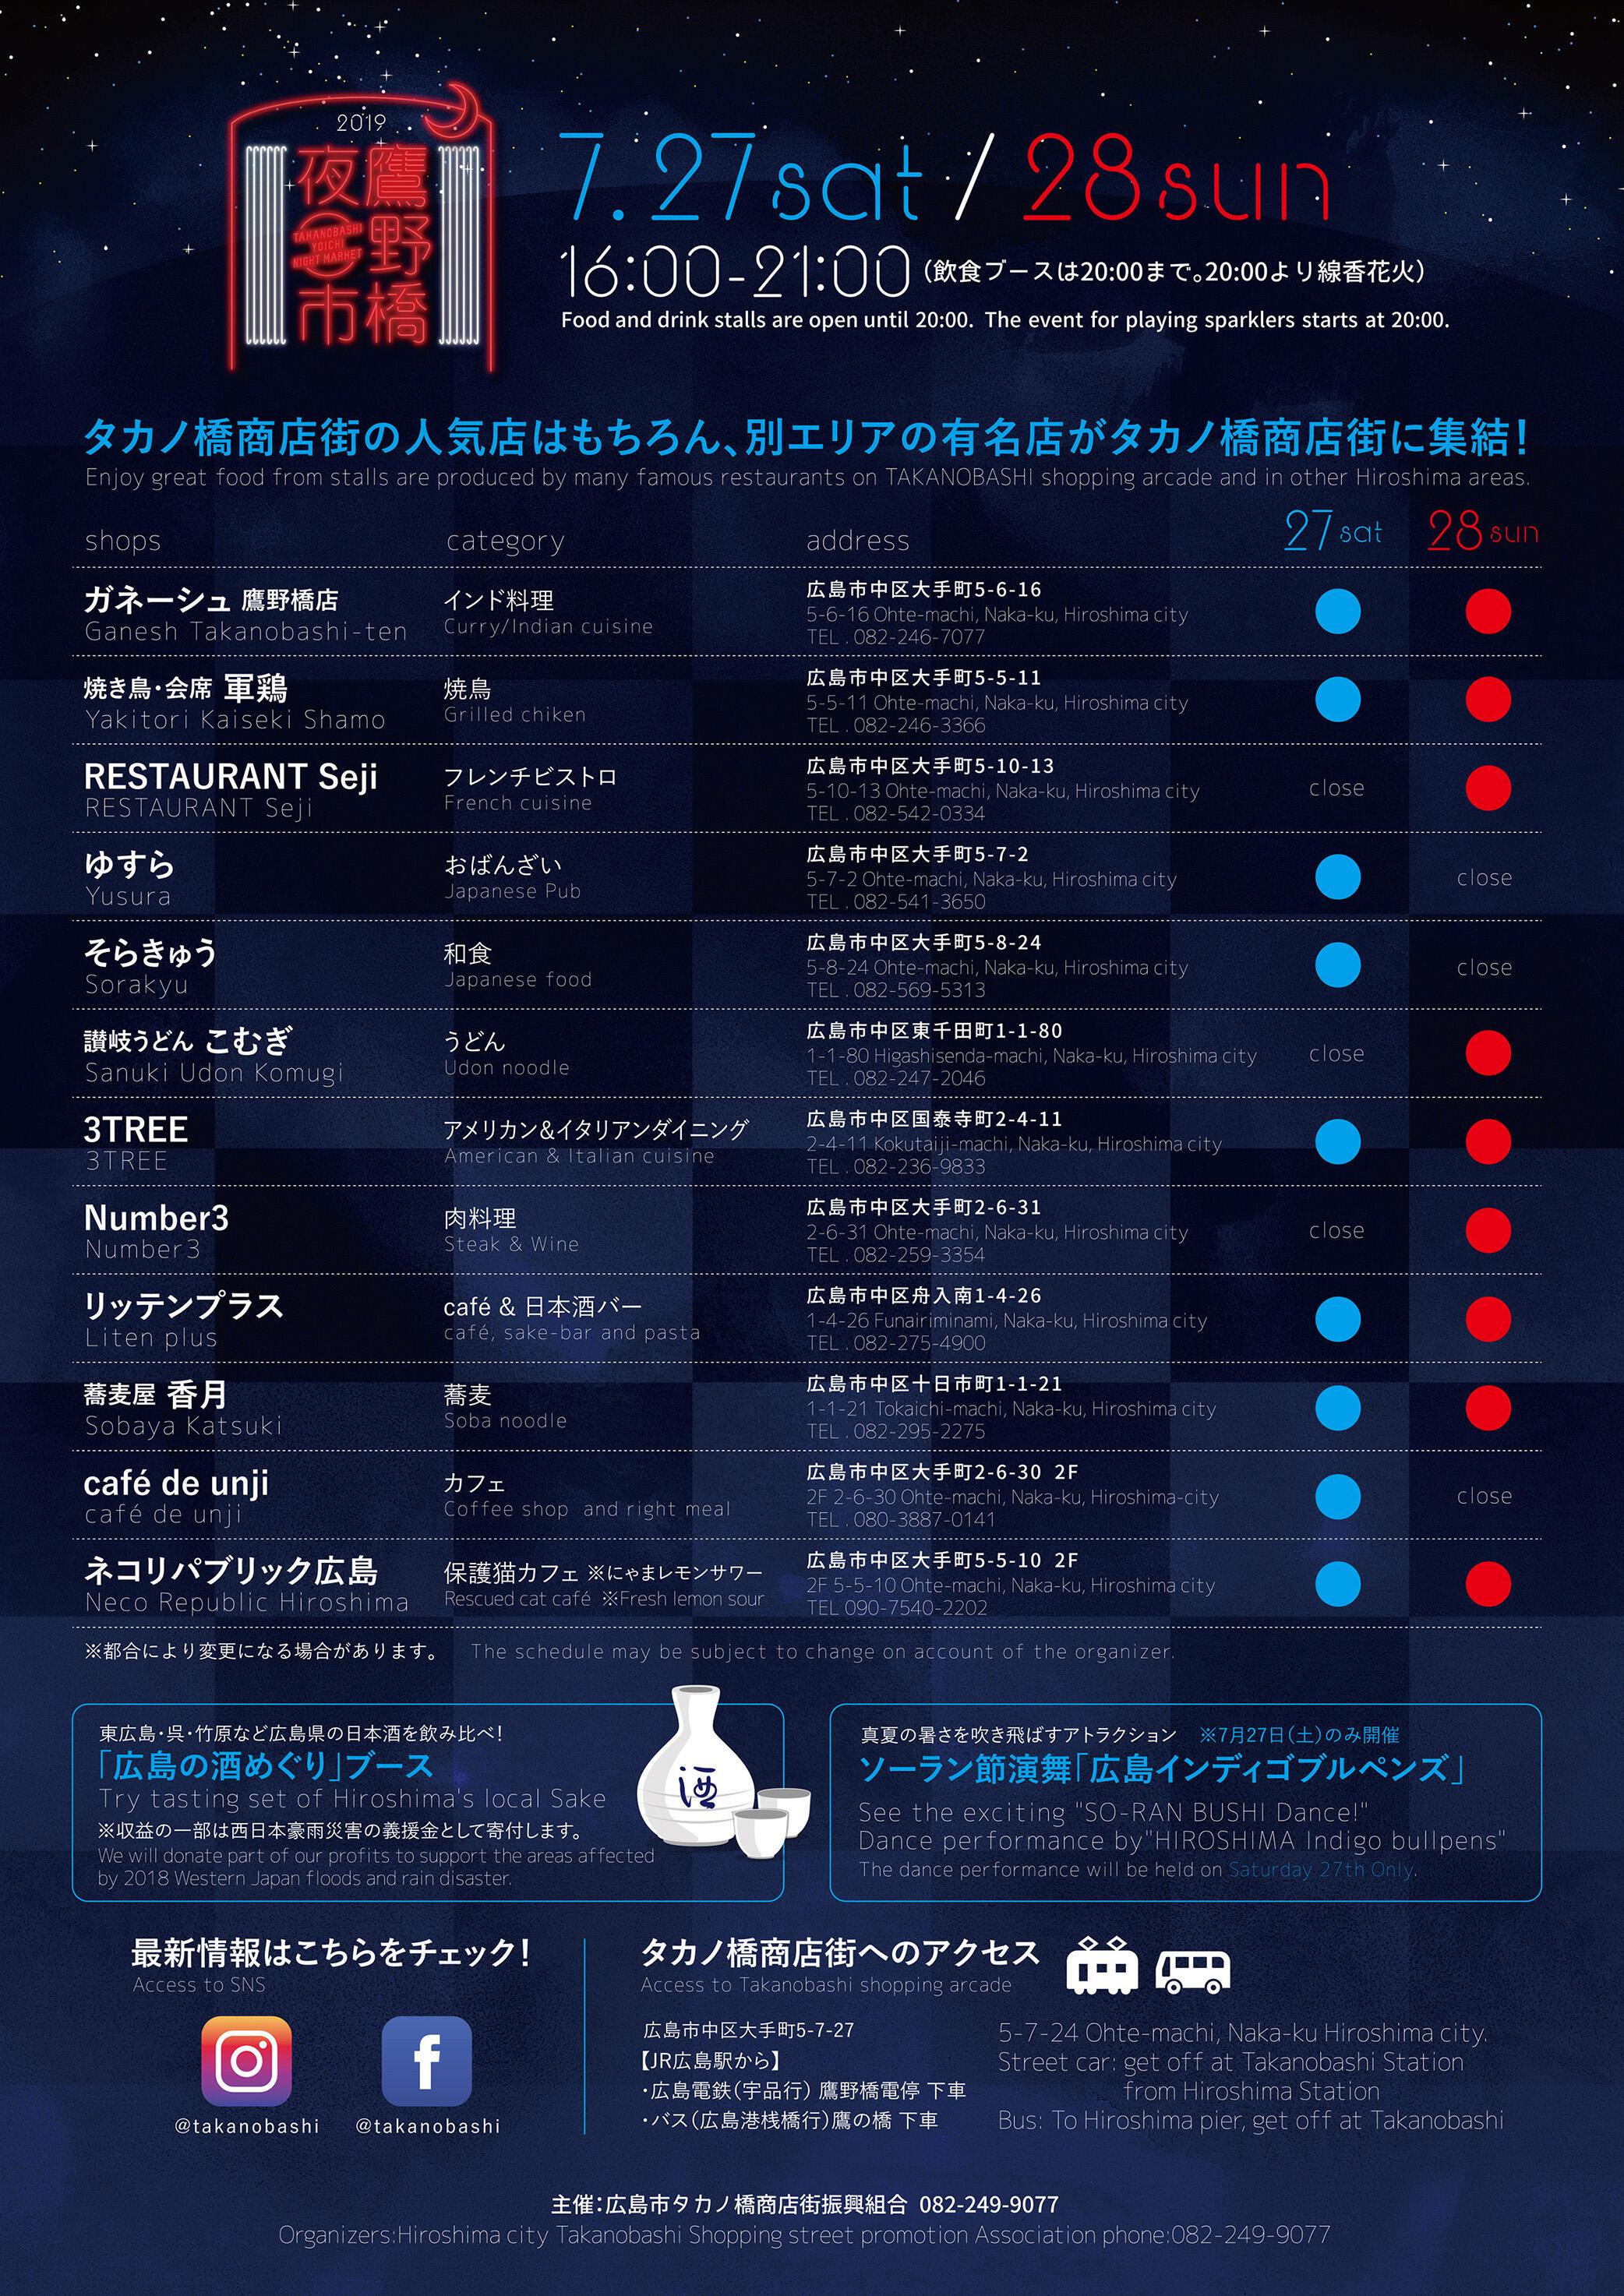 http://coaki.jp/hiroshima/takanobashi_ura.jpg